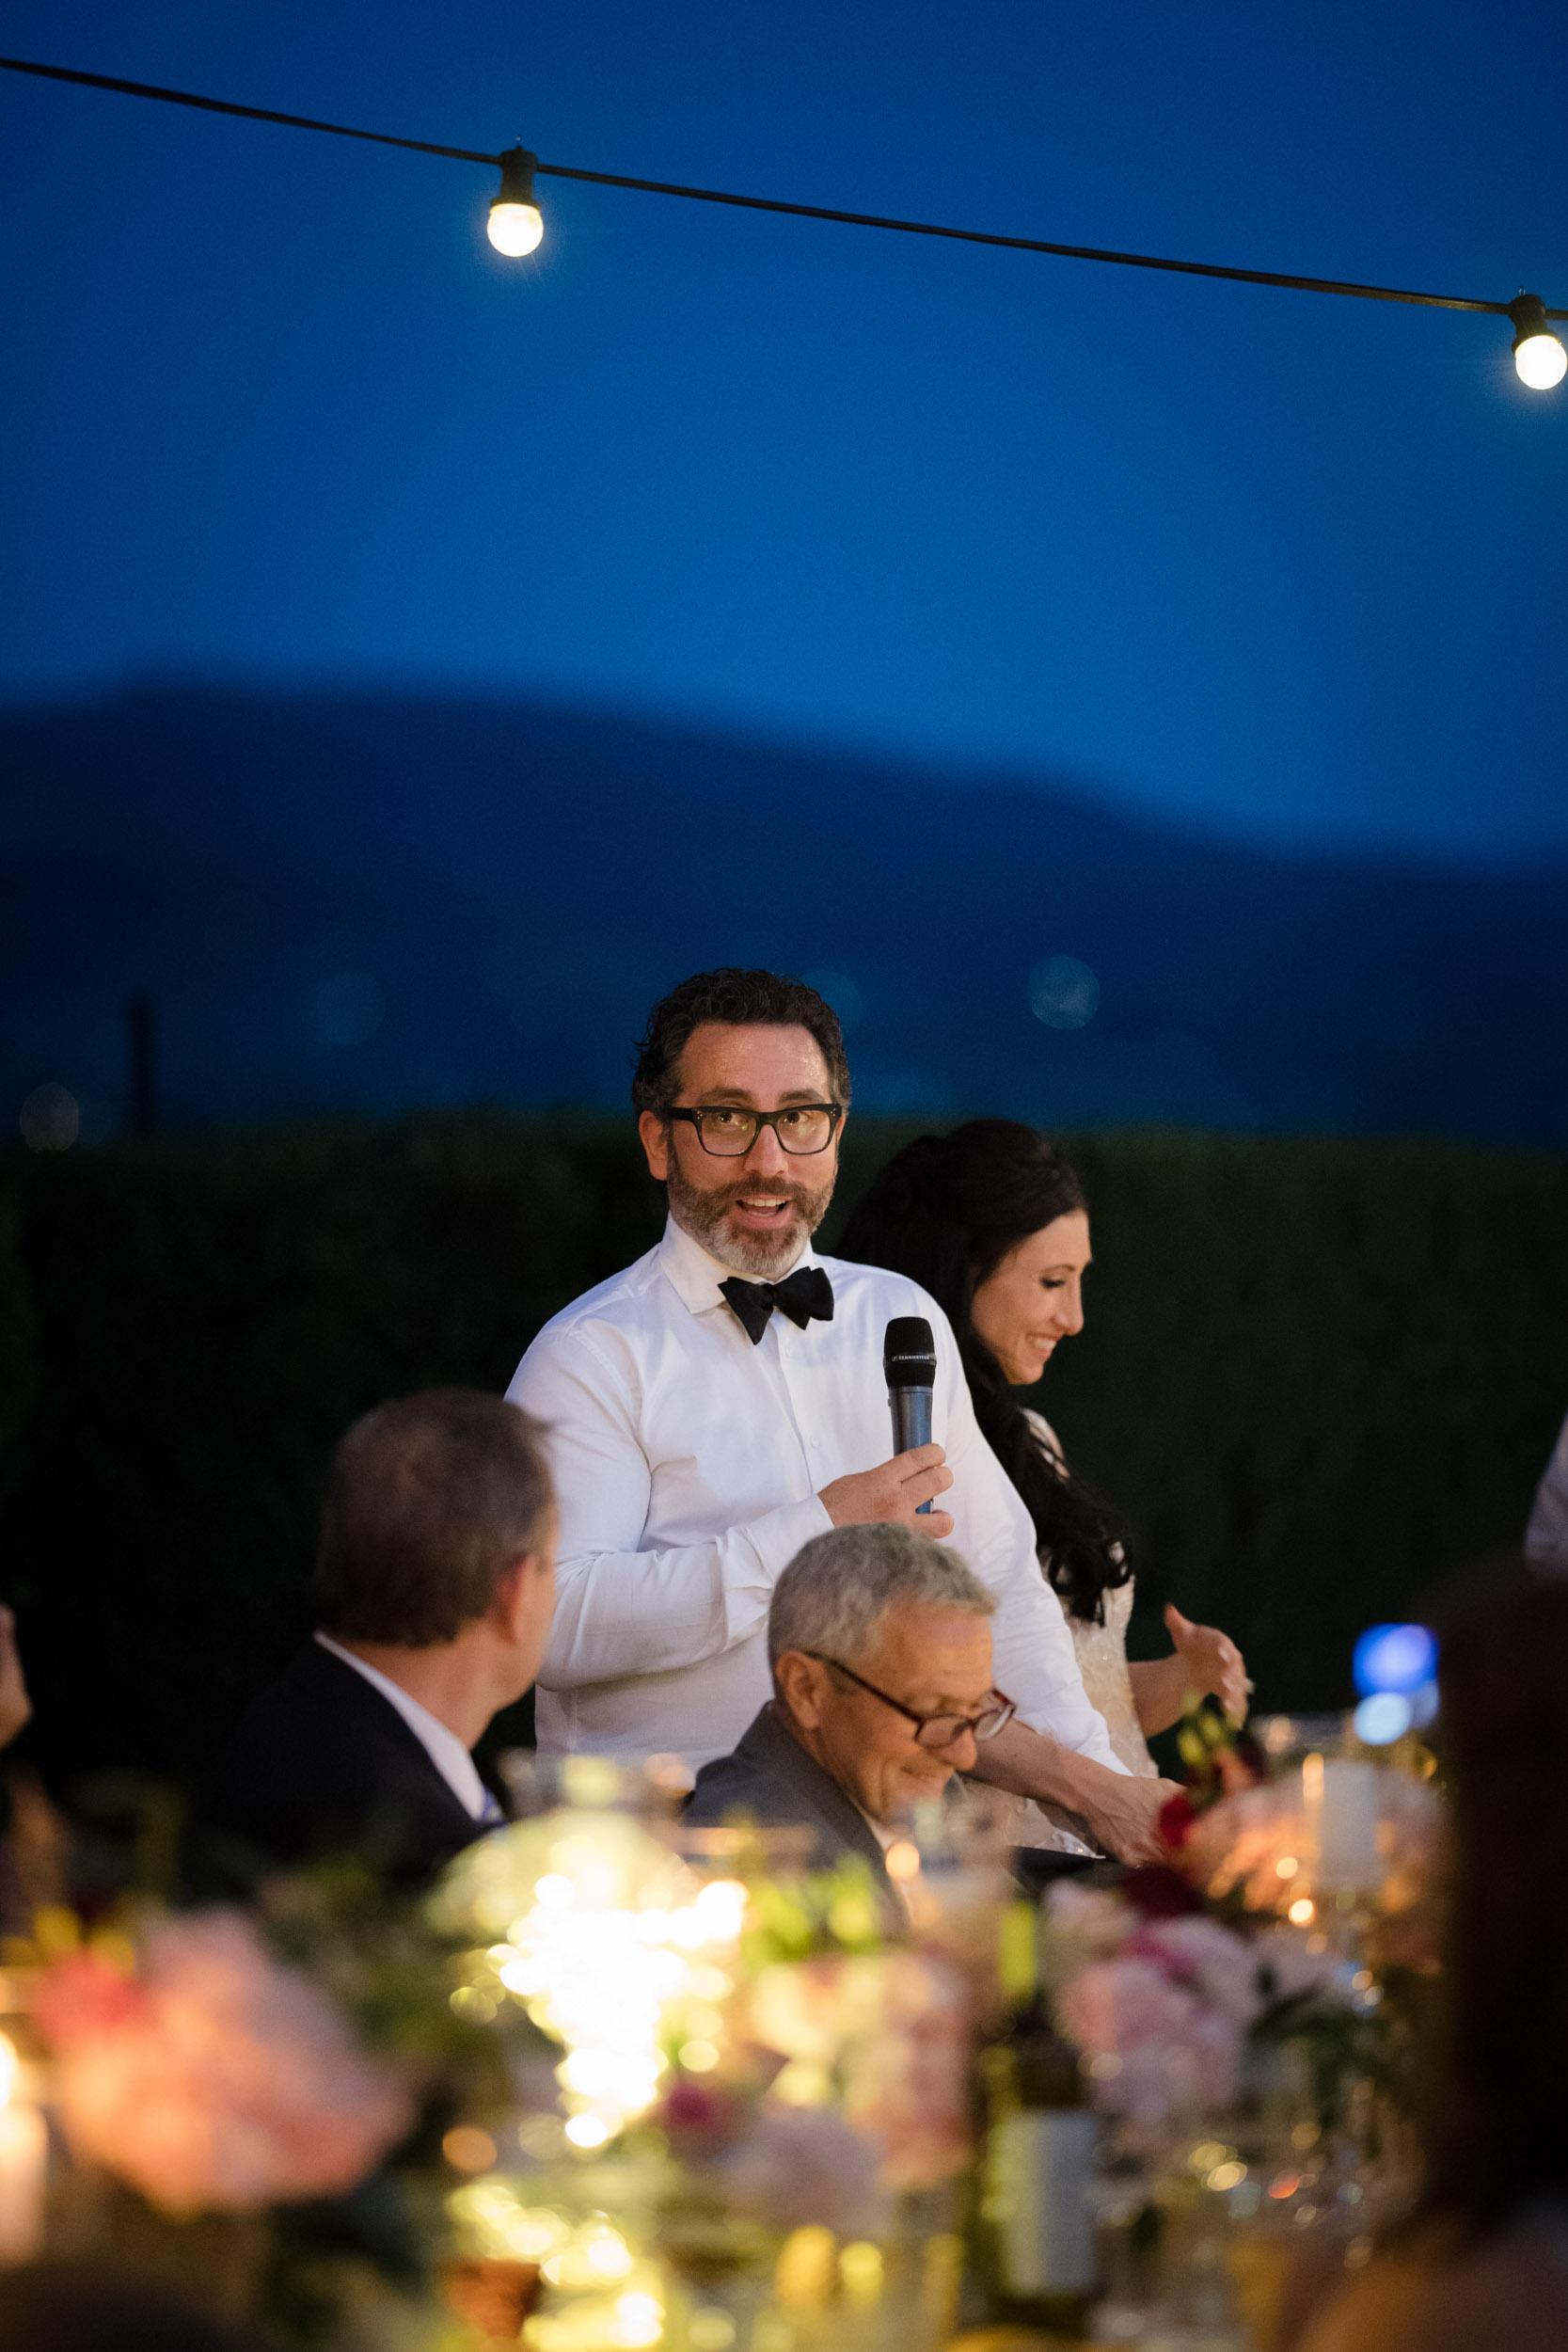 villa-gamberaia-florence-italy-destination-wedding-74.jpg